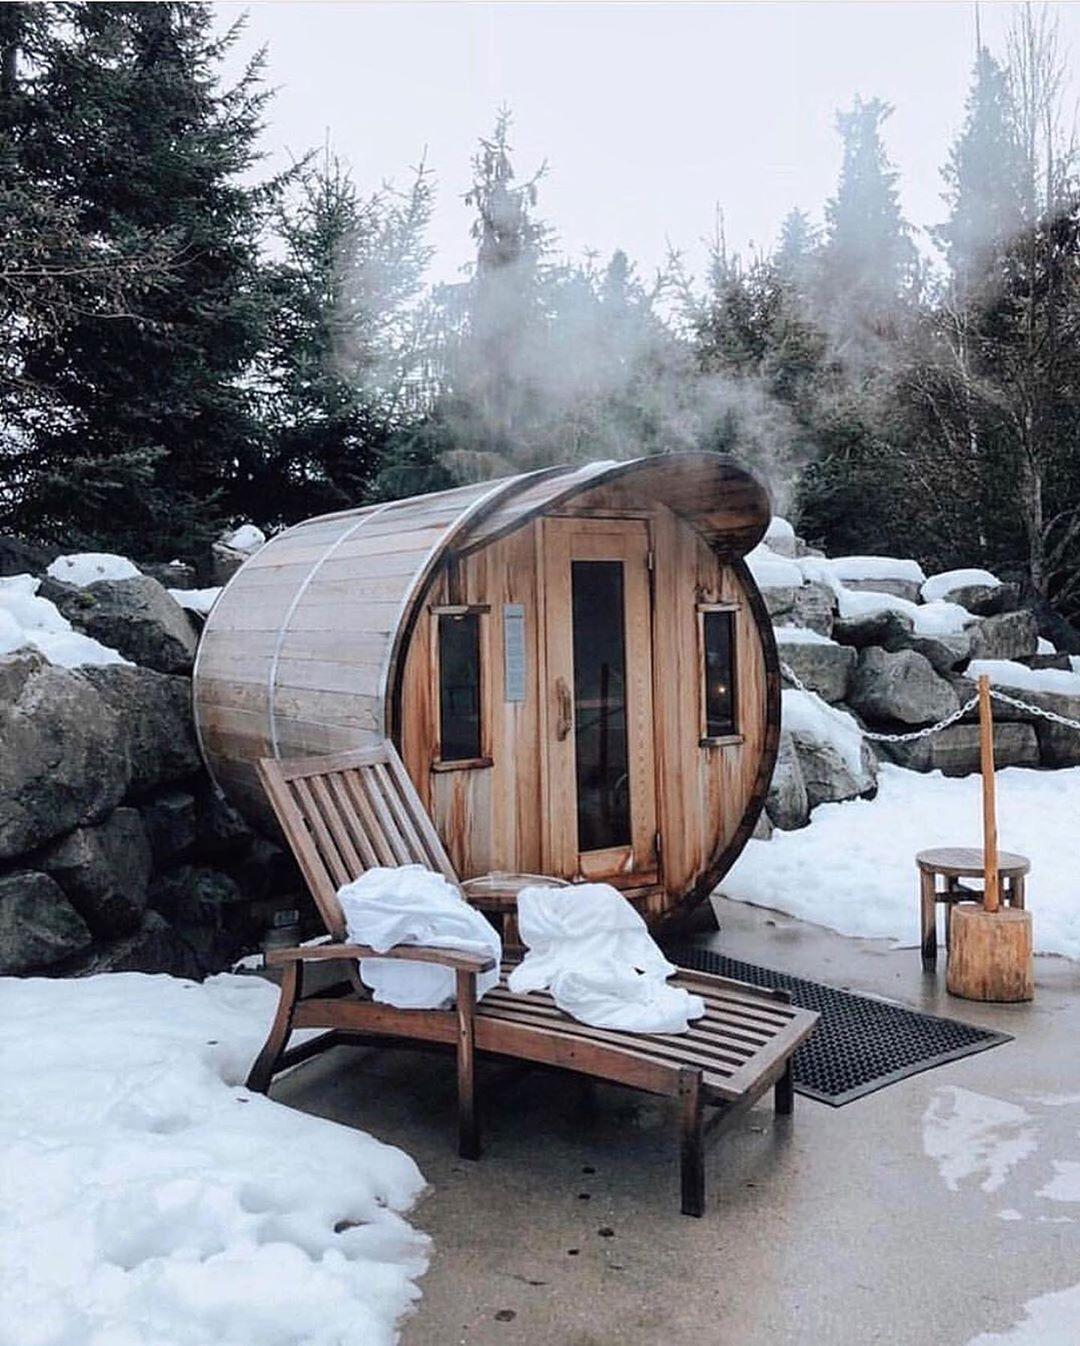 Rejuvenate at Whistler Scandinave Spa in 2020 Chalet